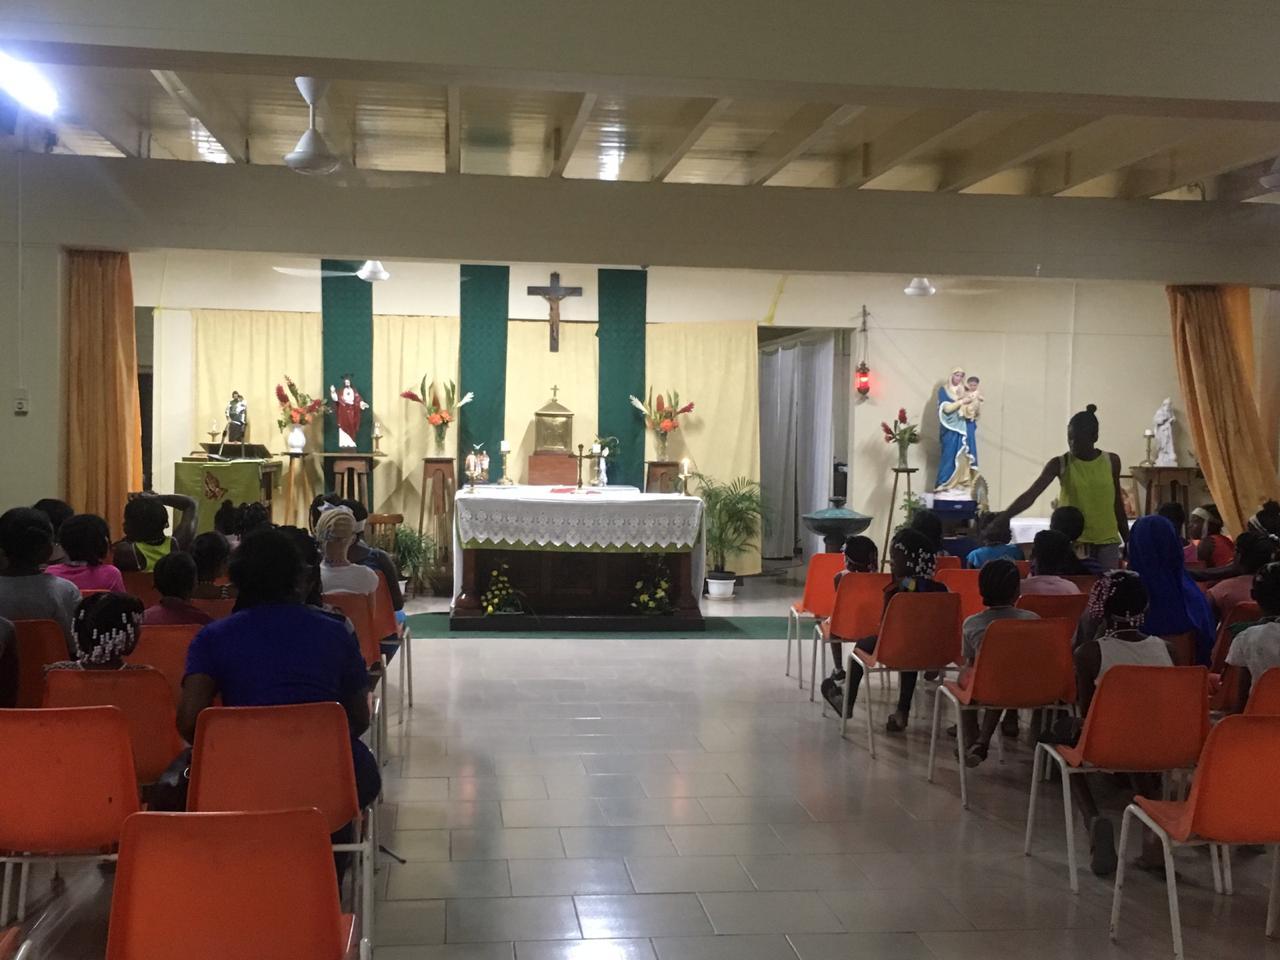 Suriname_Kinderkamp_2018_Servidoras